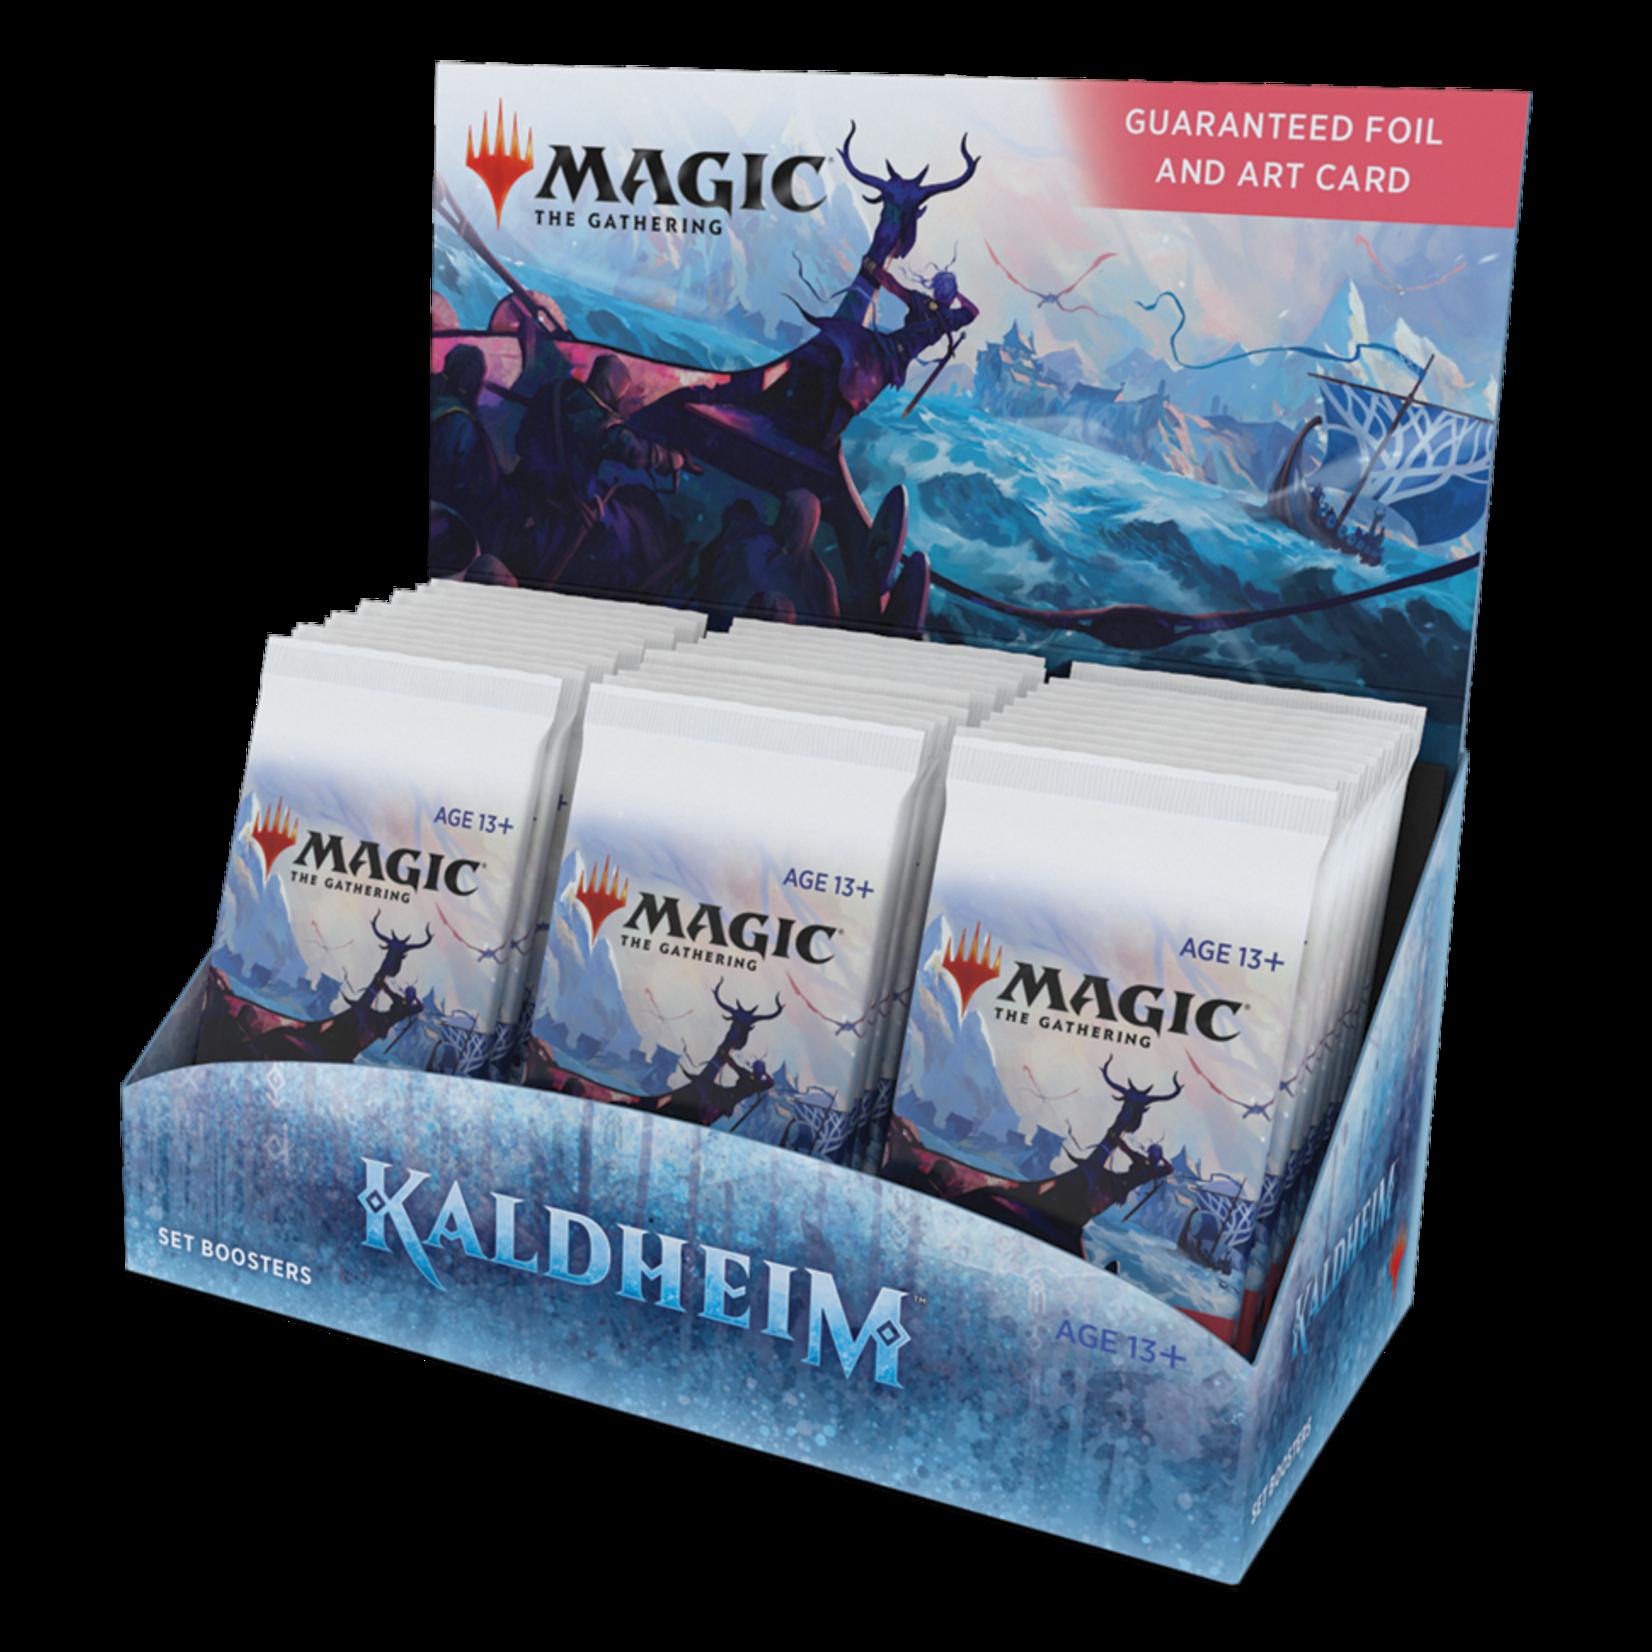 Magic: The Gathering Magic: The Gathering - Kaldheim Set Booster Box